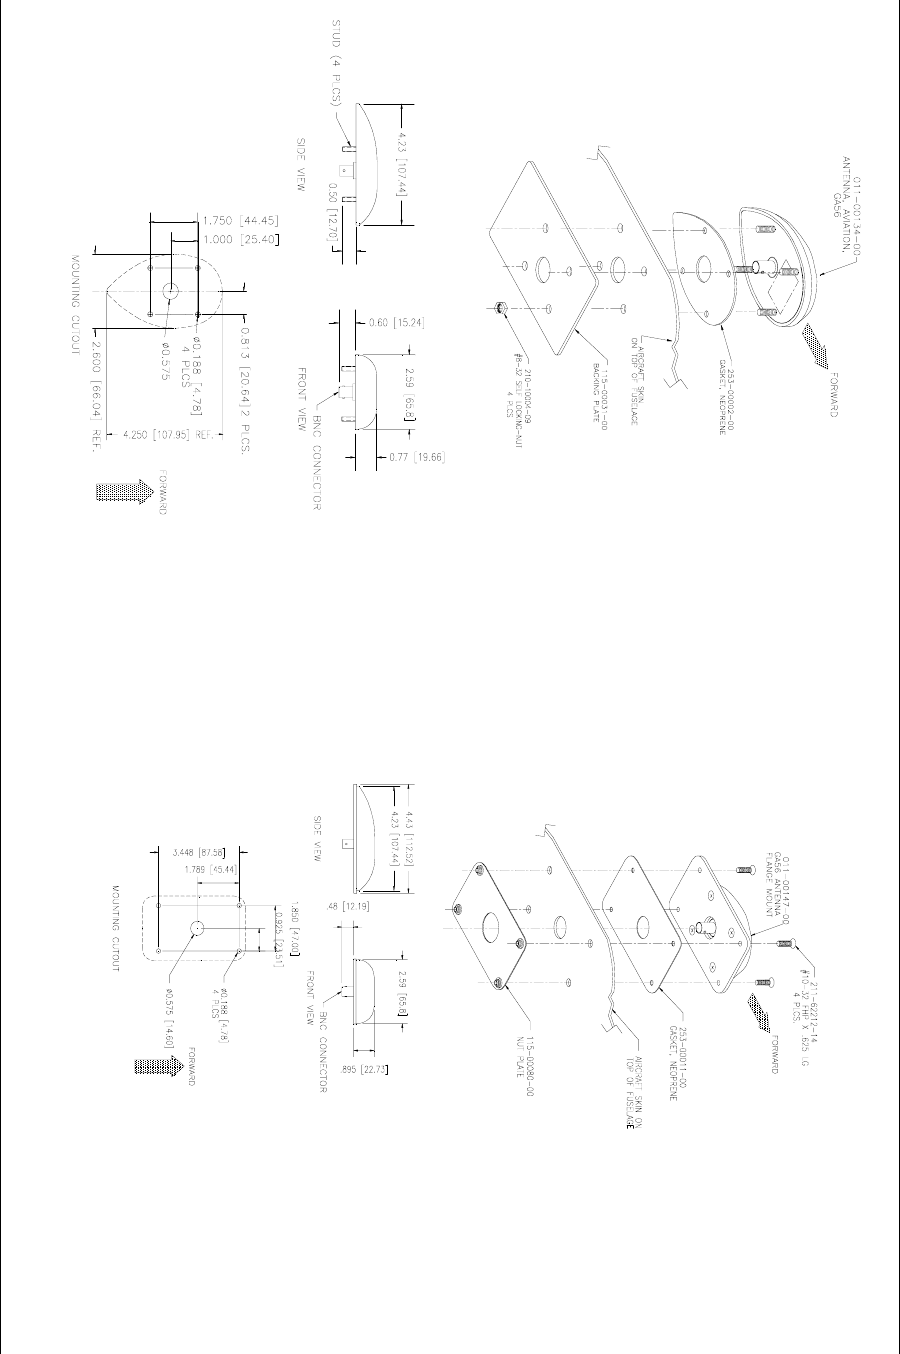 Handleiding Garmin Gns 430 Pagina 25 Van 124 English Wiring Diagram 400 Series Installation Manual Page 3 9 10 Blank